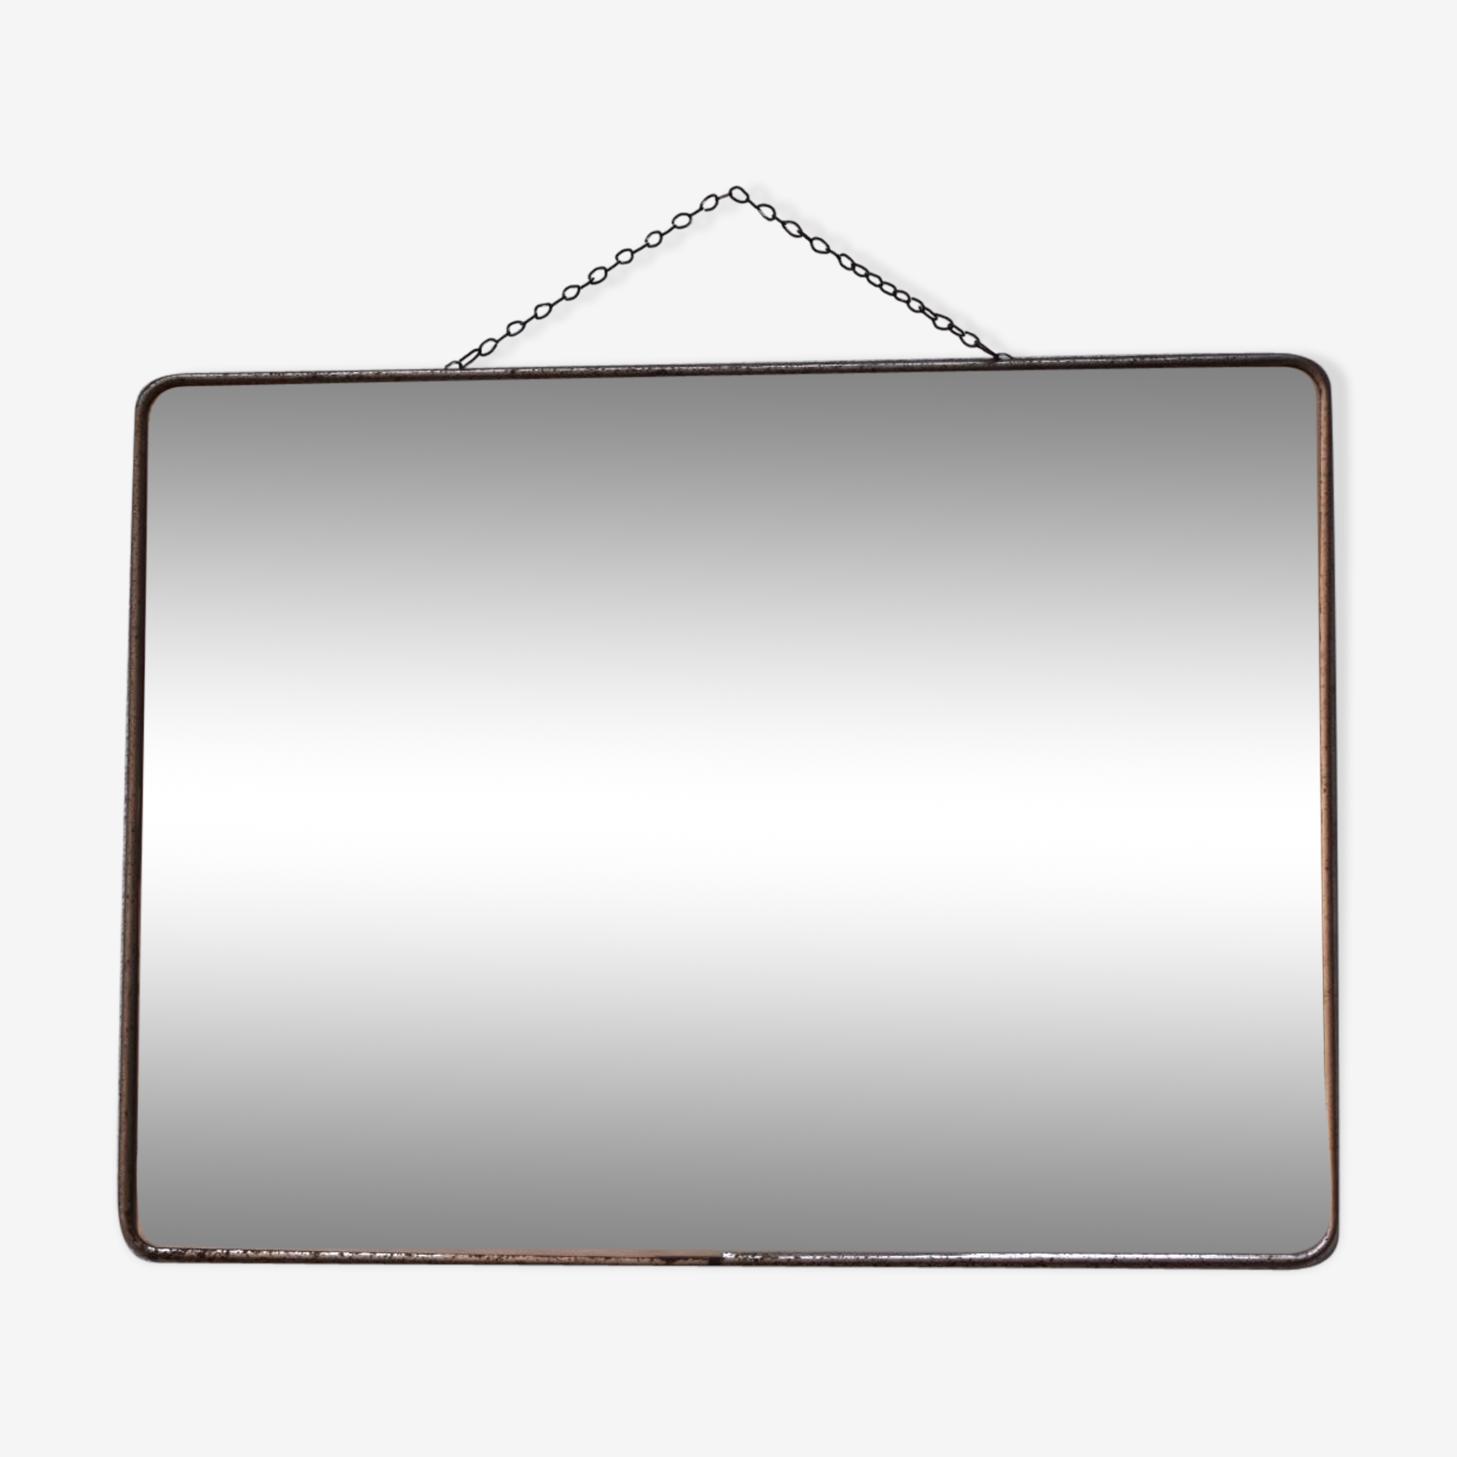 Barber mirror 40x30cm